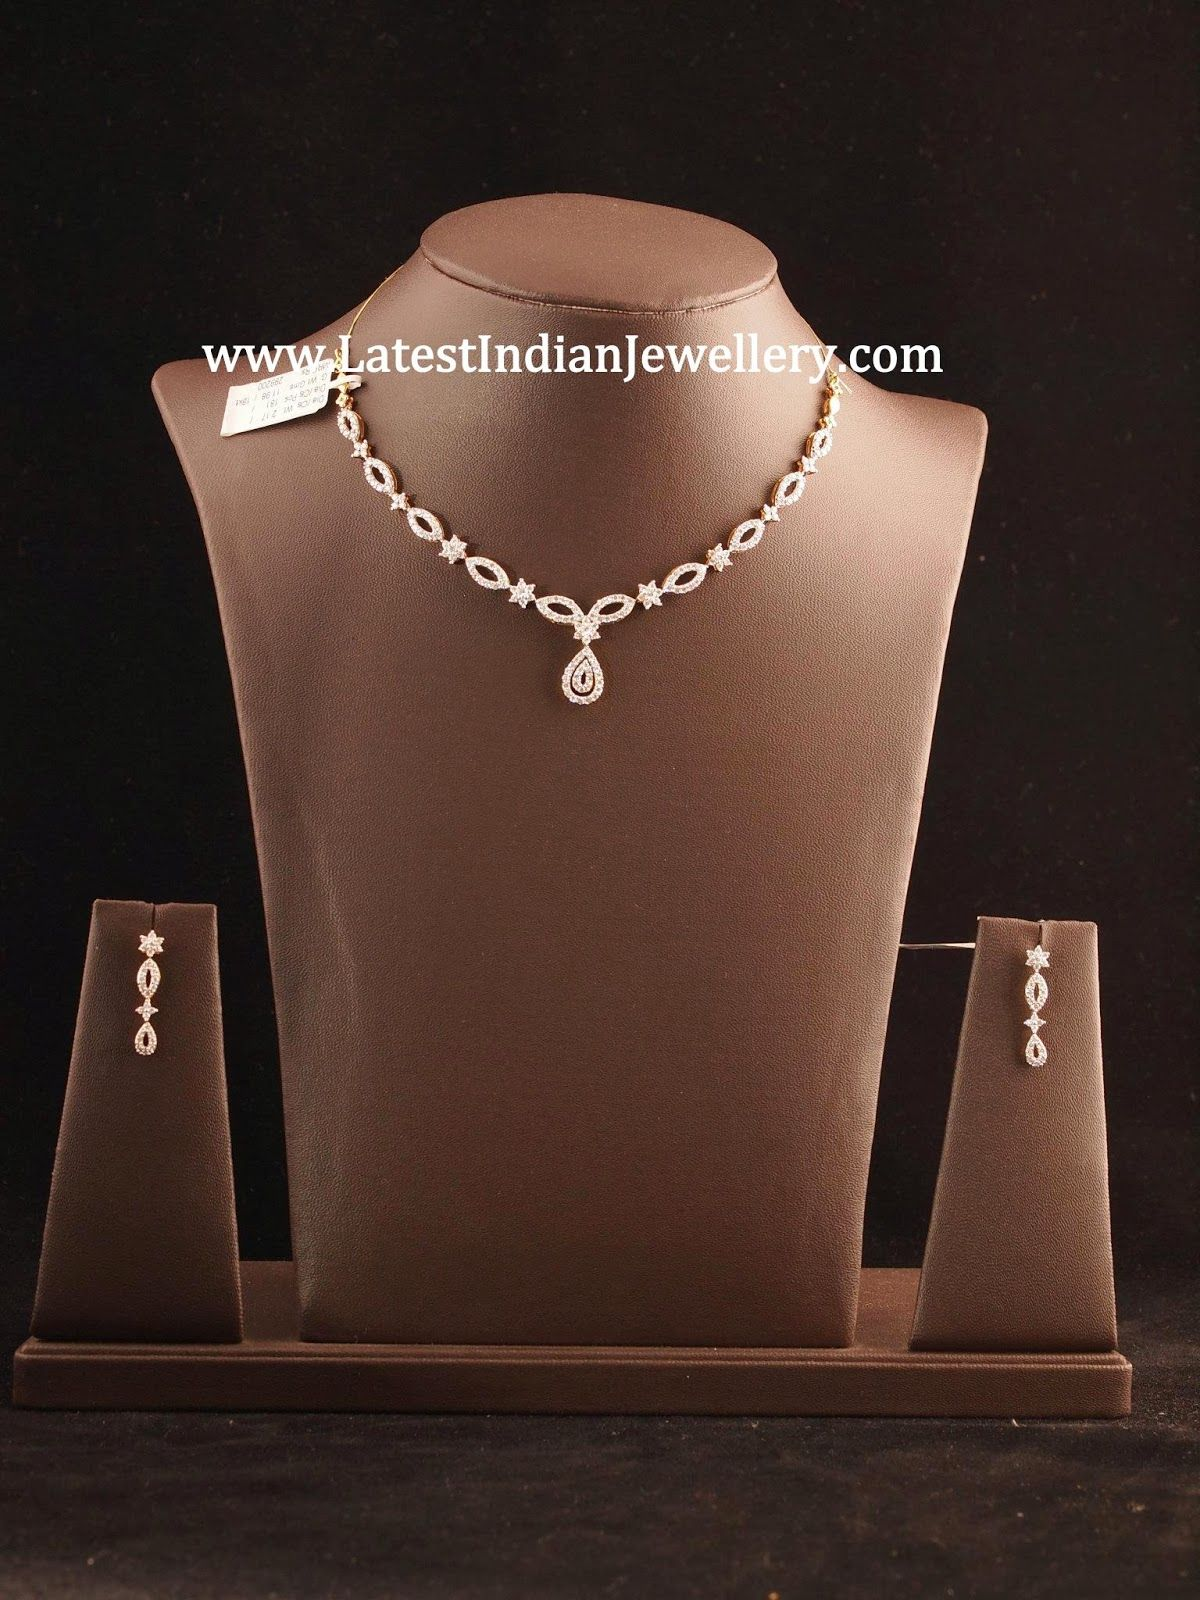 Simple gold diamond necklacestylish simple diamond necklace sets